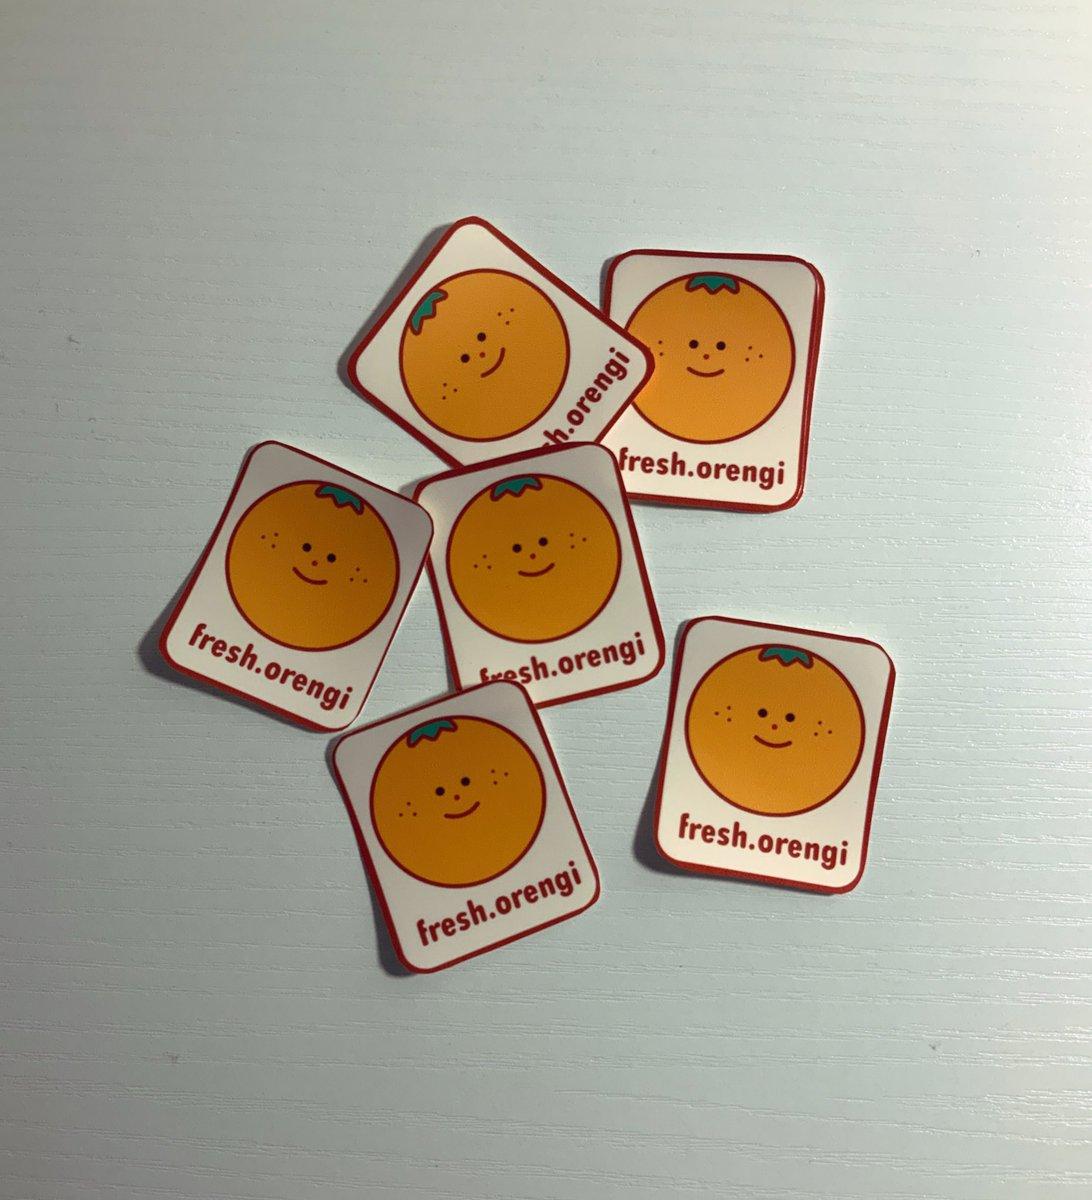 First test print on Logo Stickers! What do you think?   #Stickers #originalart #orange pic.twitter.com/KILXaZsBOk